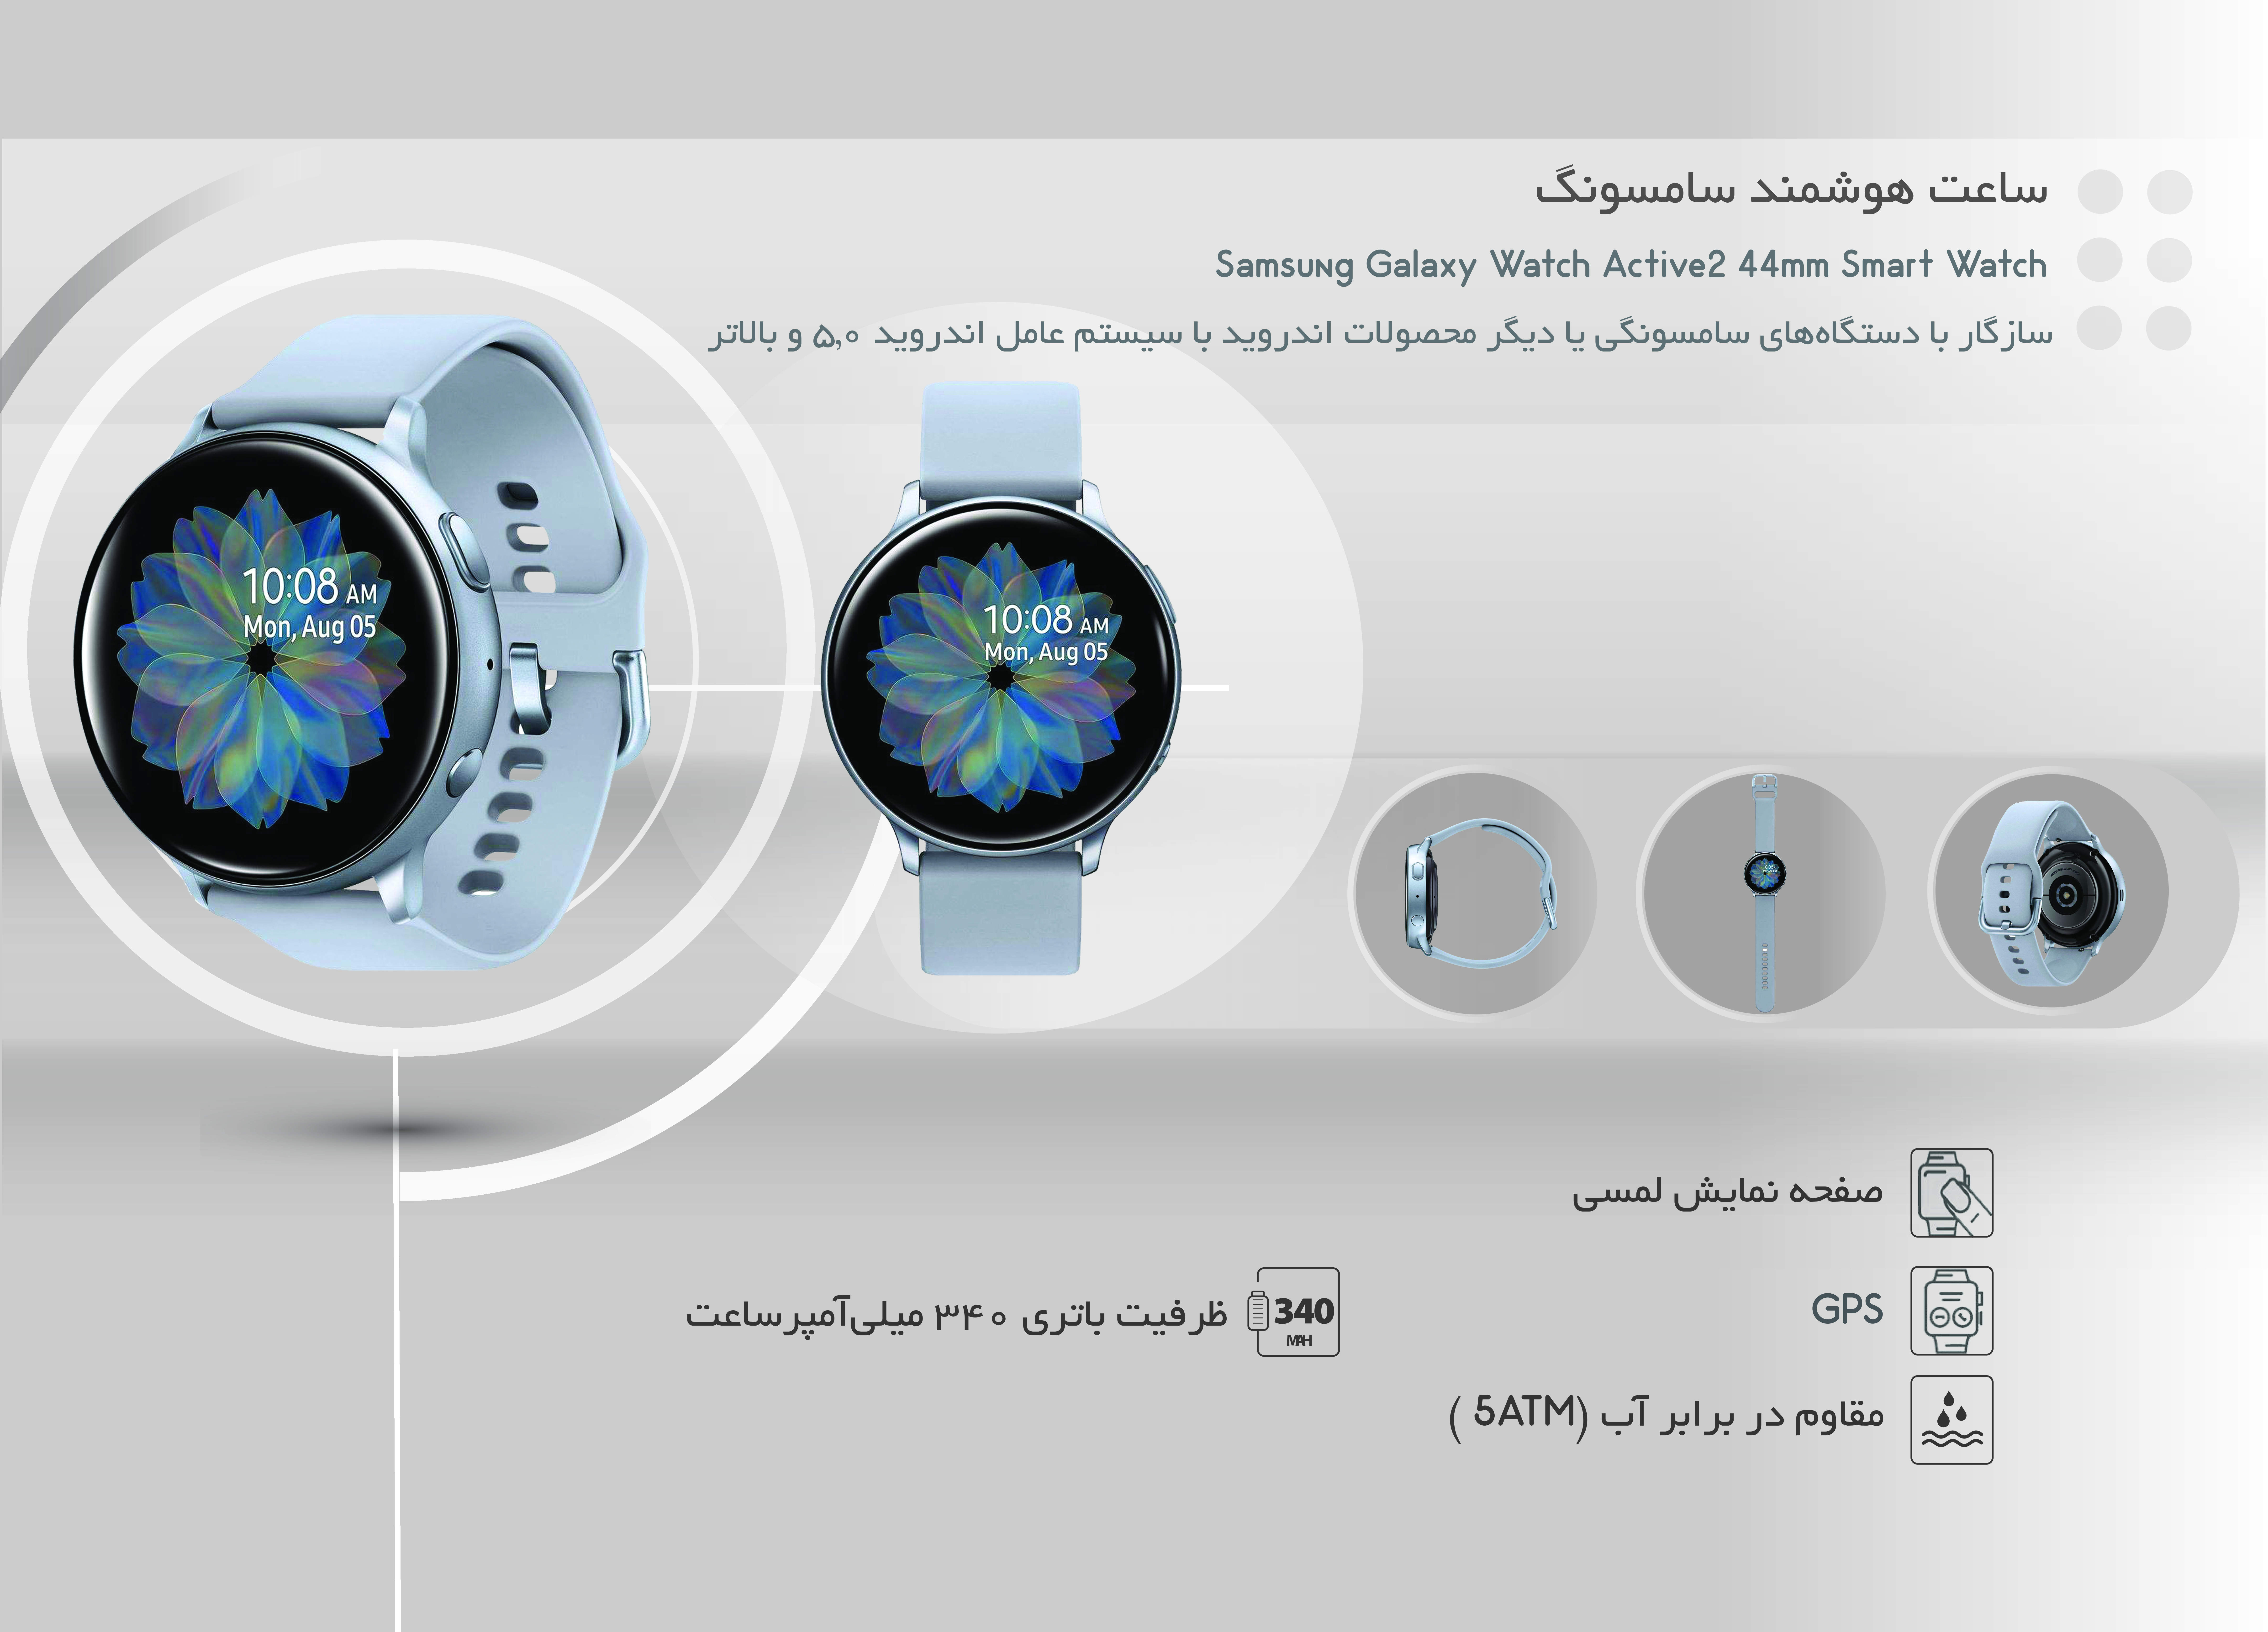 ساعت مچی هوشمند سامسونگ Active 2 44mm